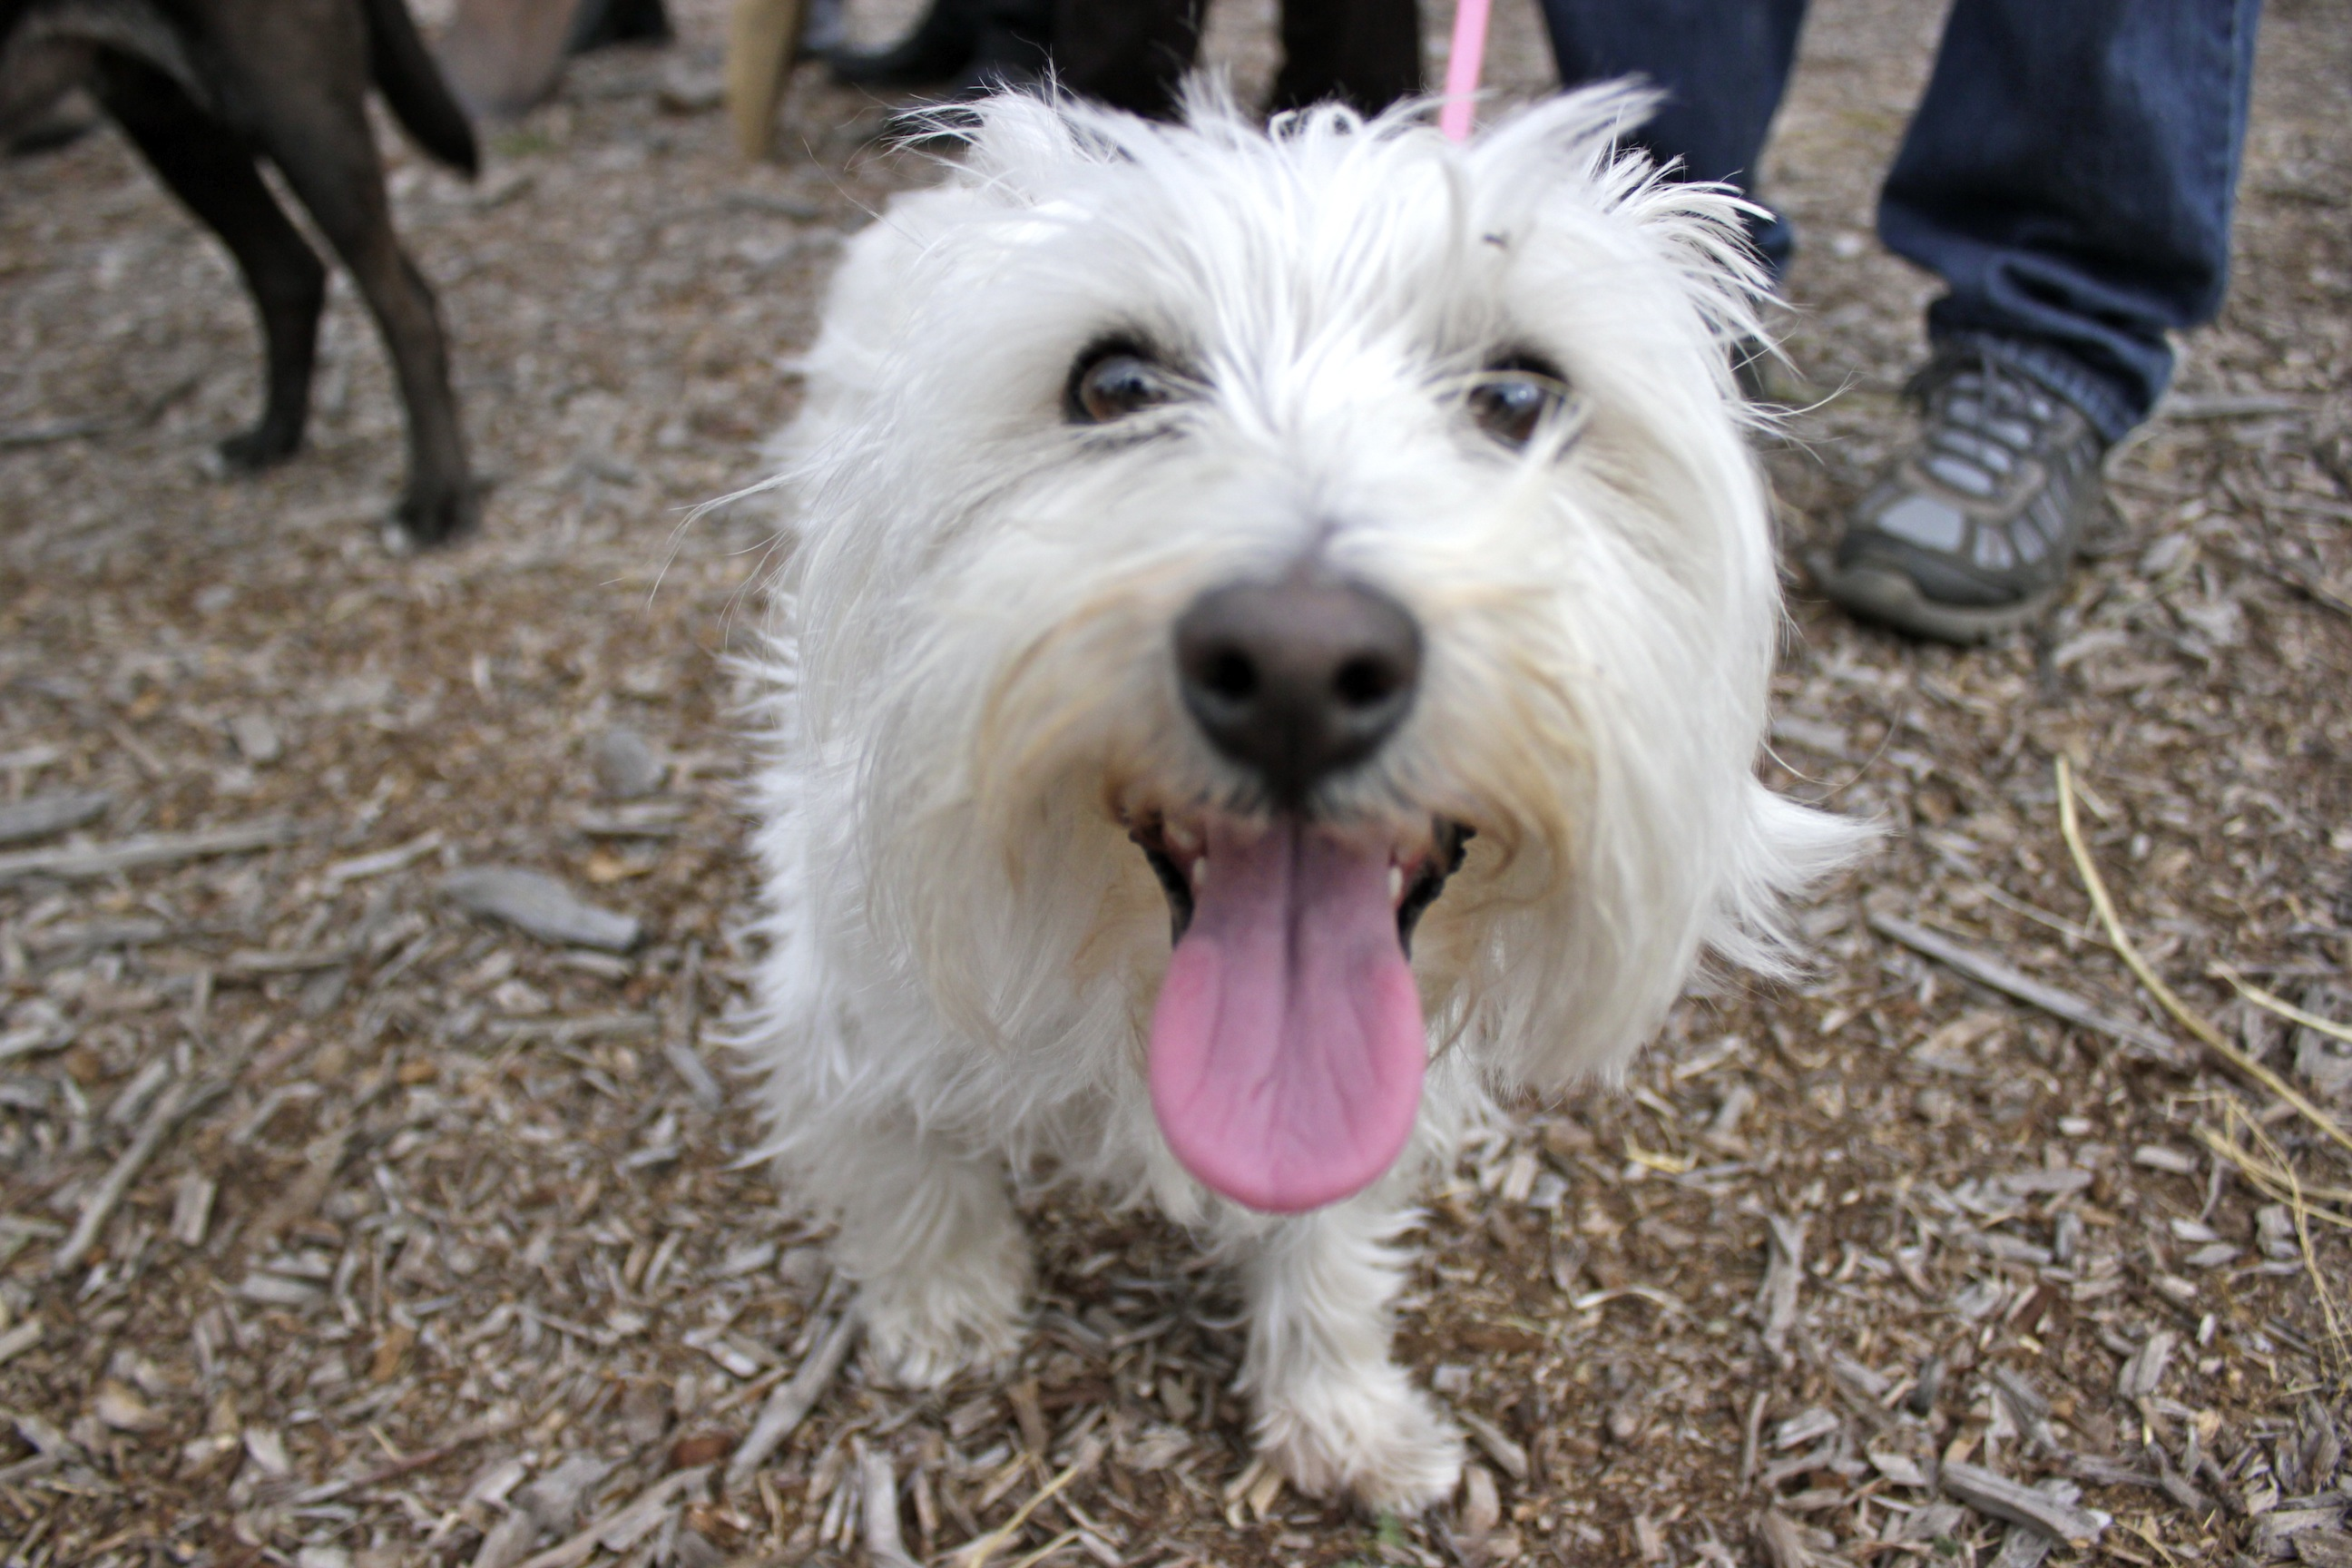 Capistrano Animal Rescue Effort member Mark Rottman's dog, Noel, also took part in the groundbreaking ceremony. Photo by Brian Park